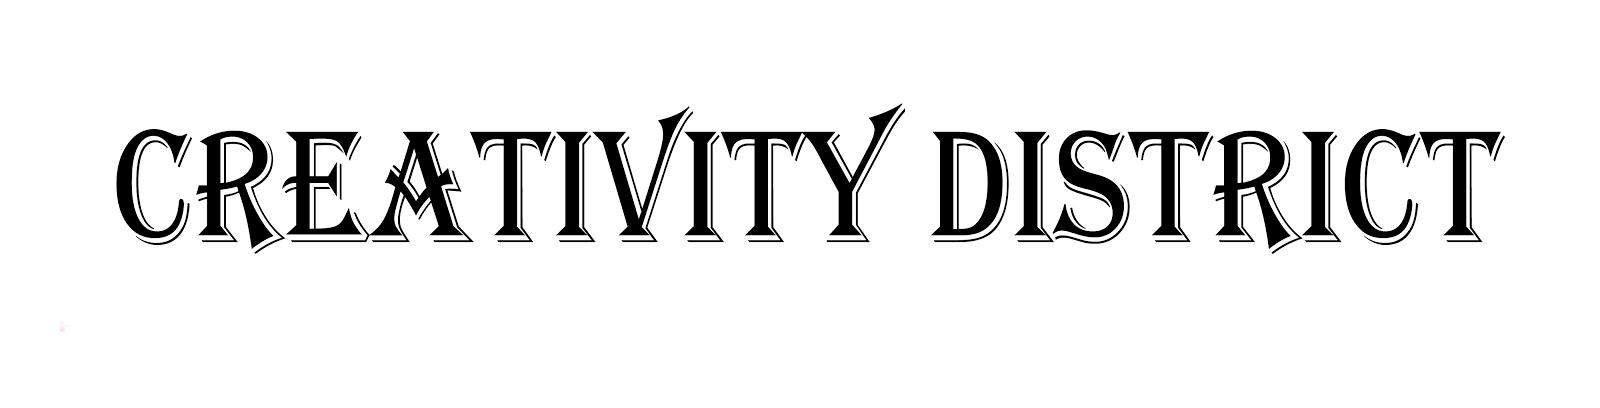 CREATIVITY DISTRICT